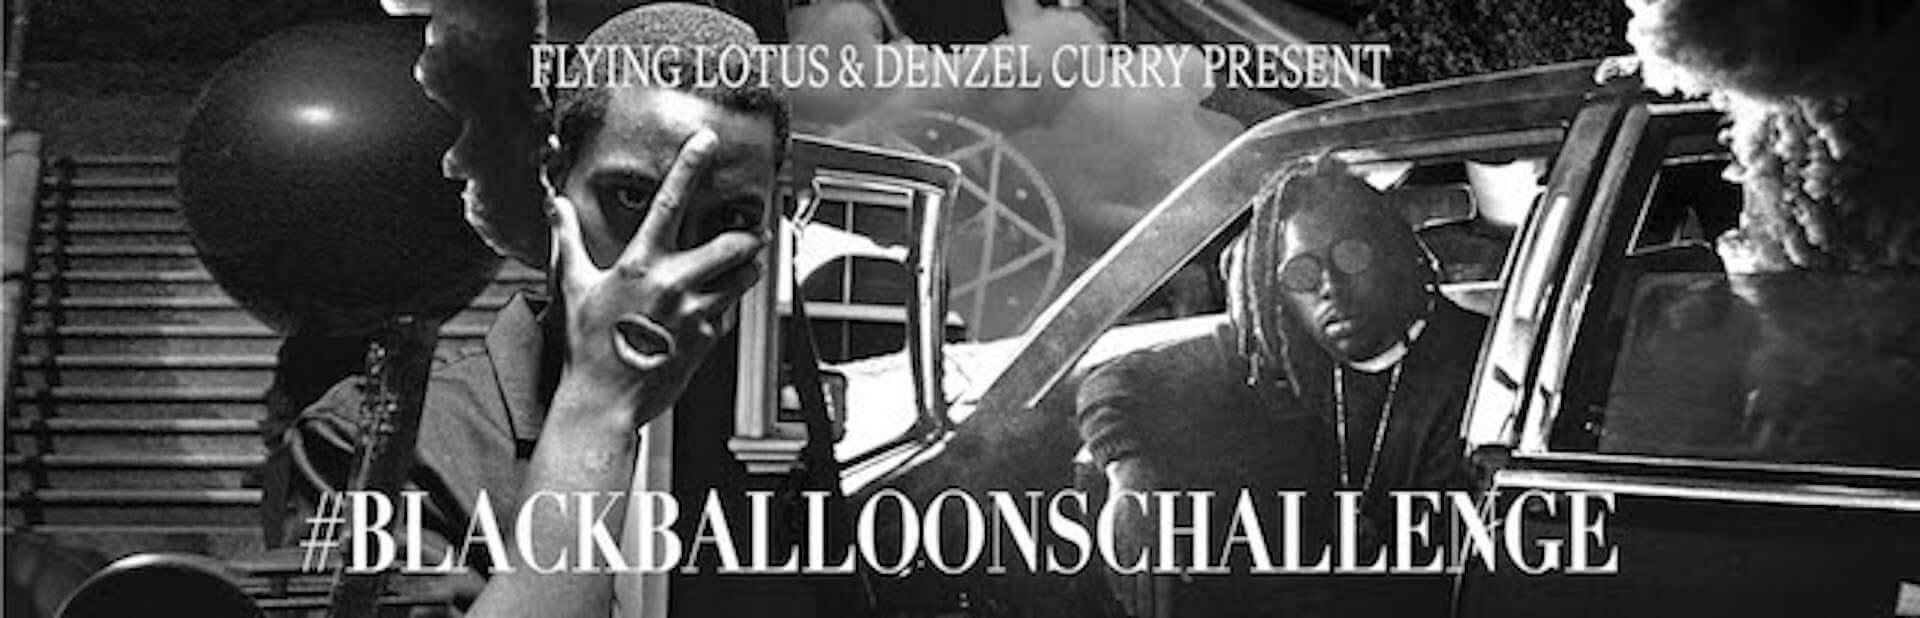 Flying LotusとDenzel Curryがオリジナルラップ募集企画「#BLACKBALLOONSCHALLENGE」を始動|優秀作品にはプレゼントも music200630_flyinglotus_5-1920x618